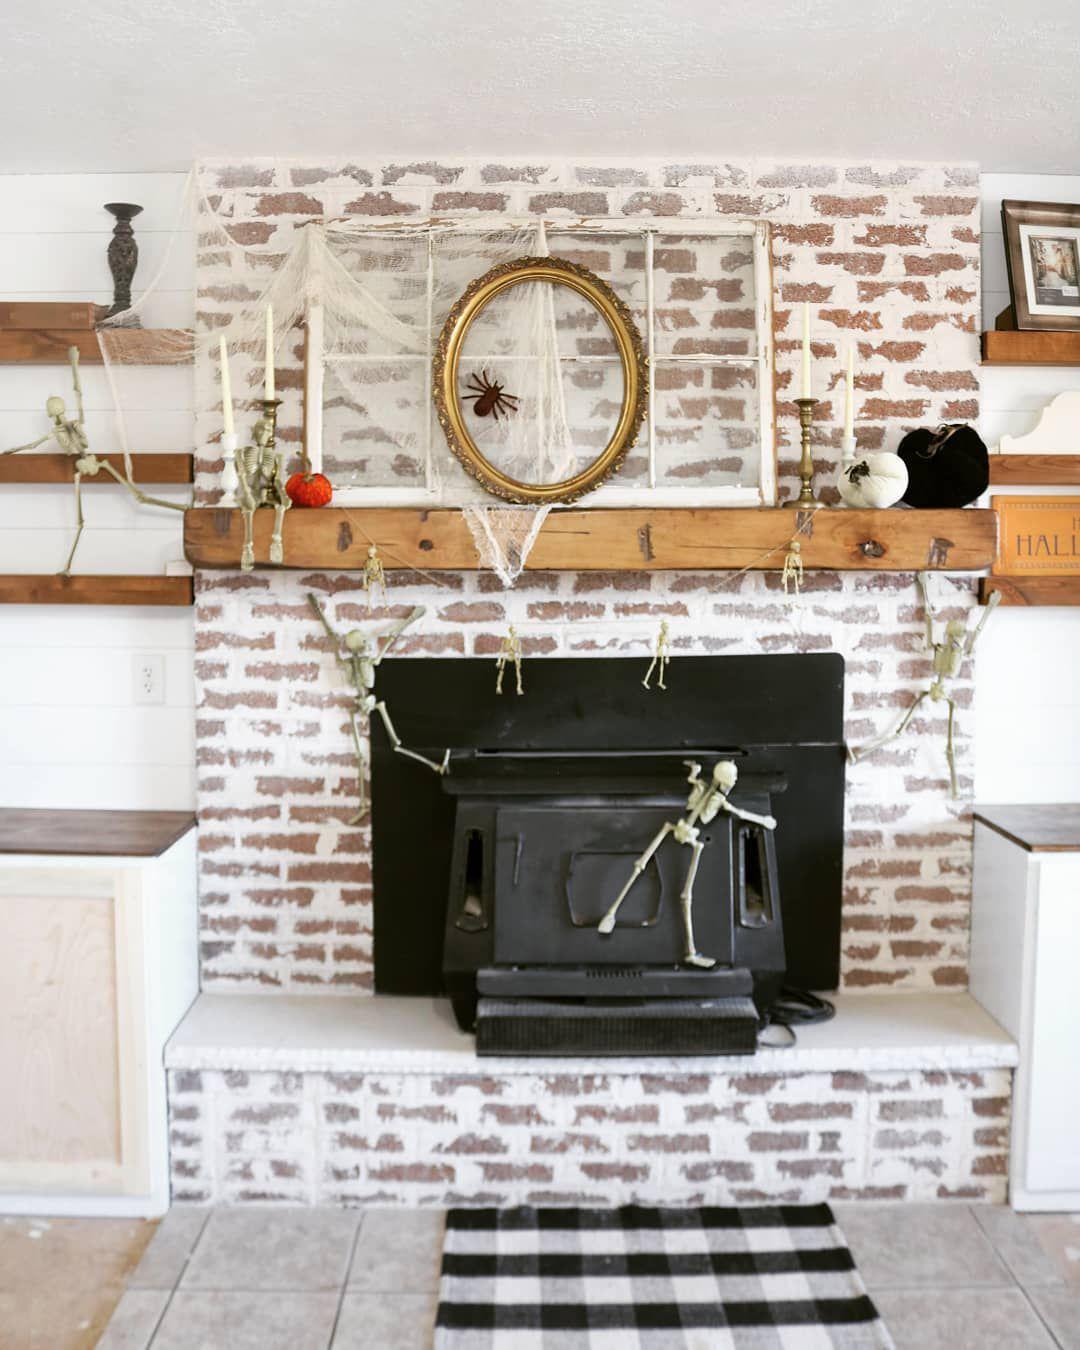 Fireplace with halloween decor